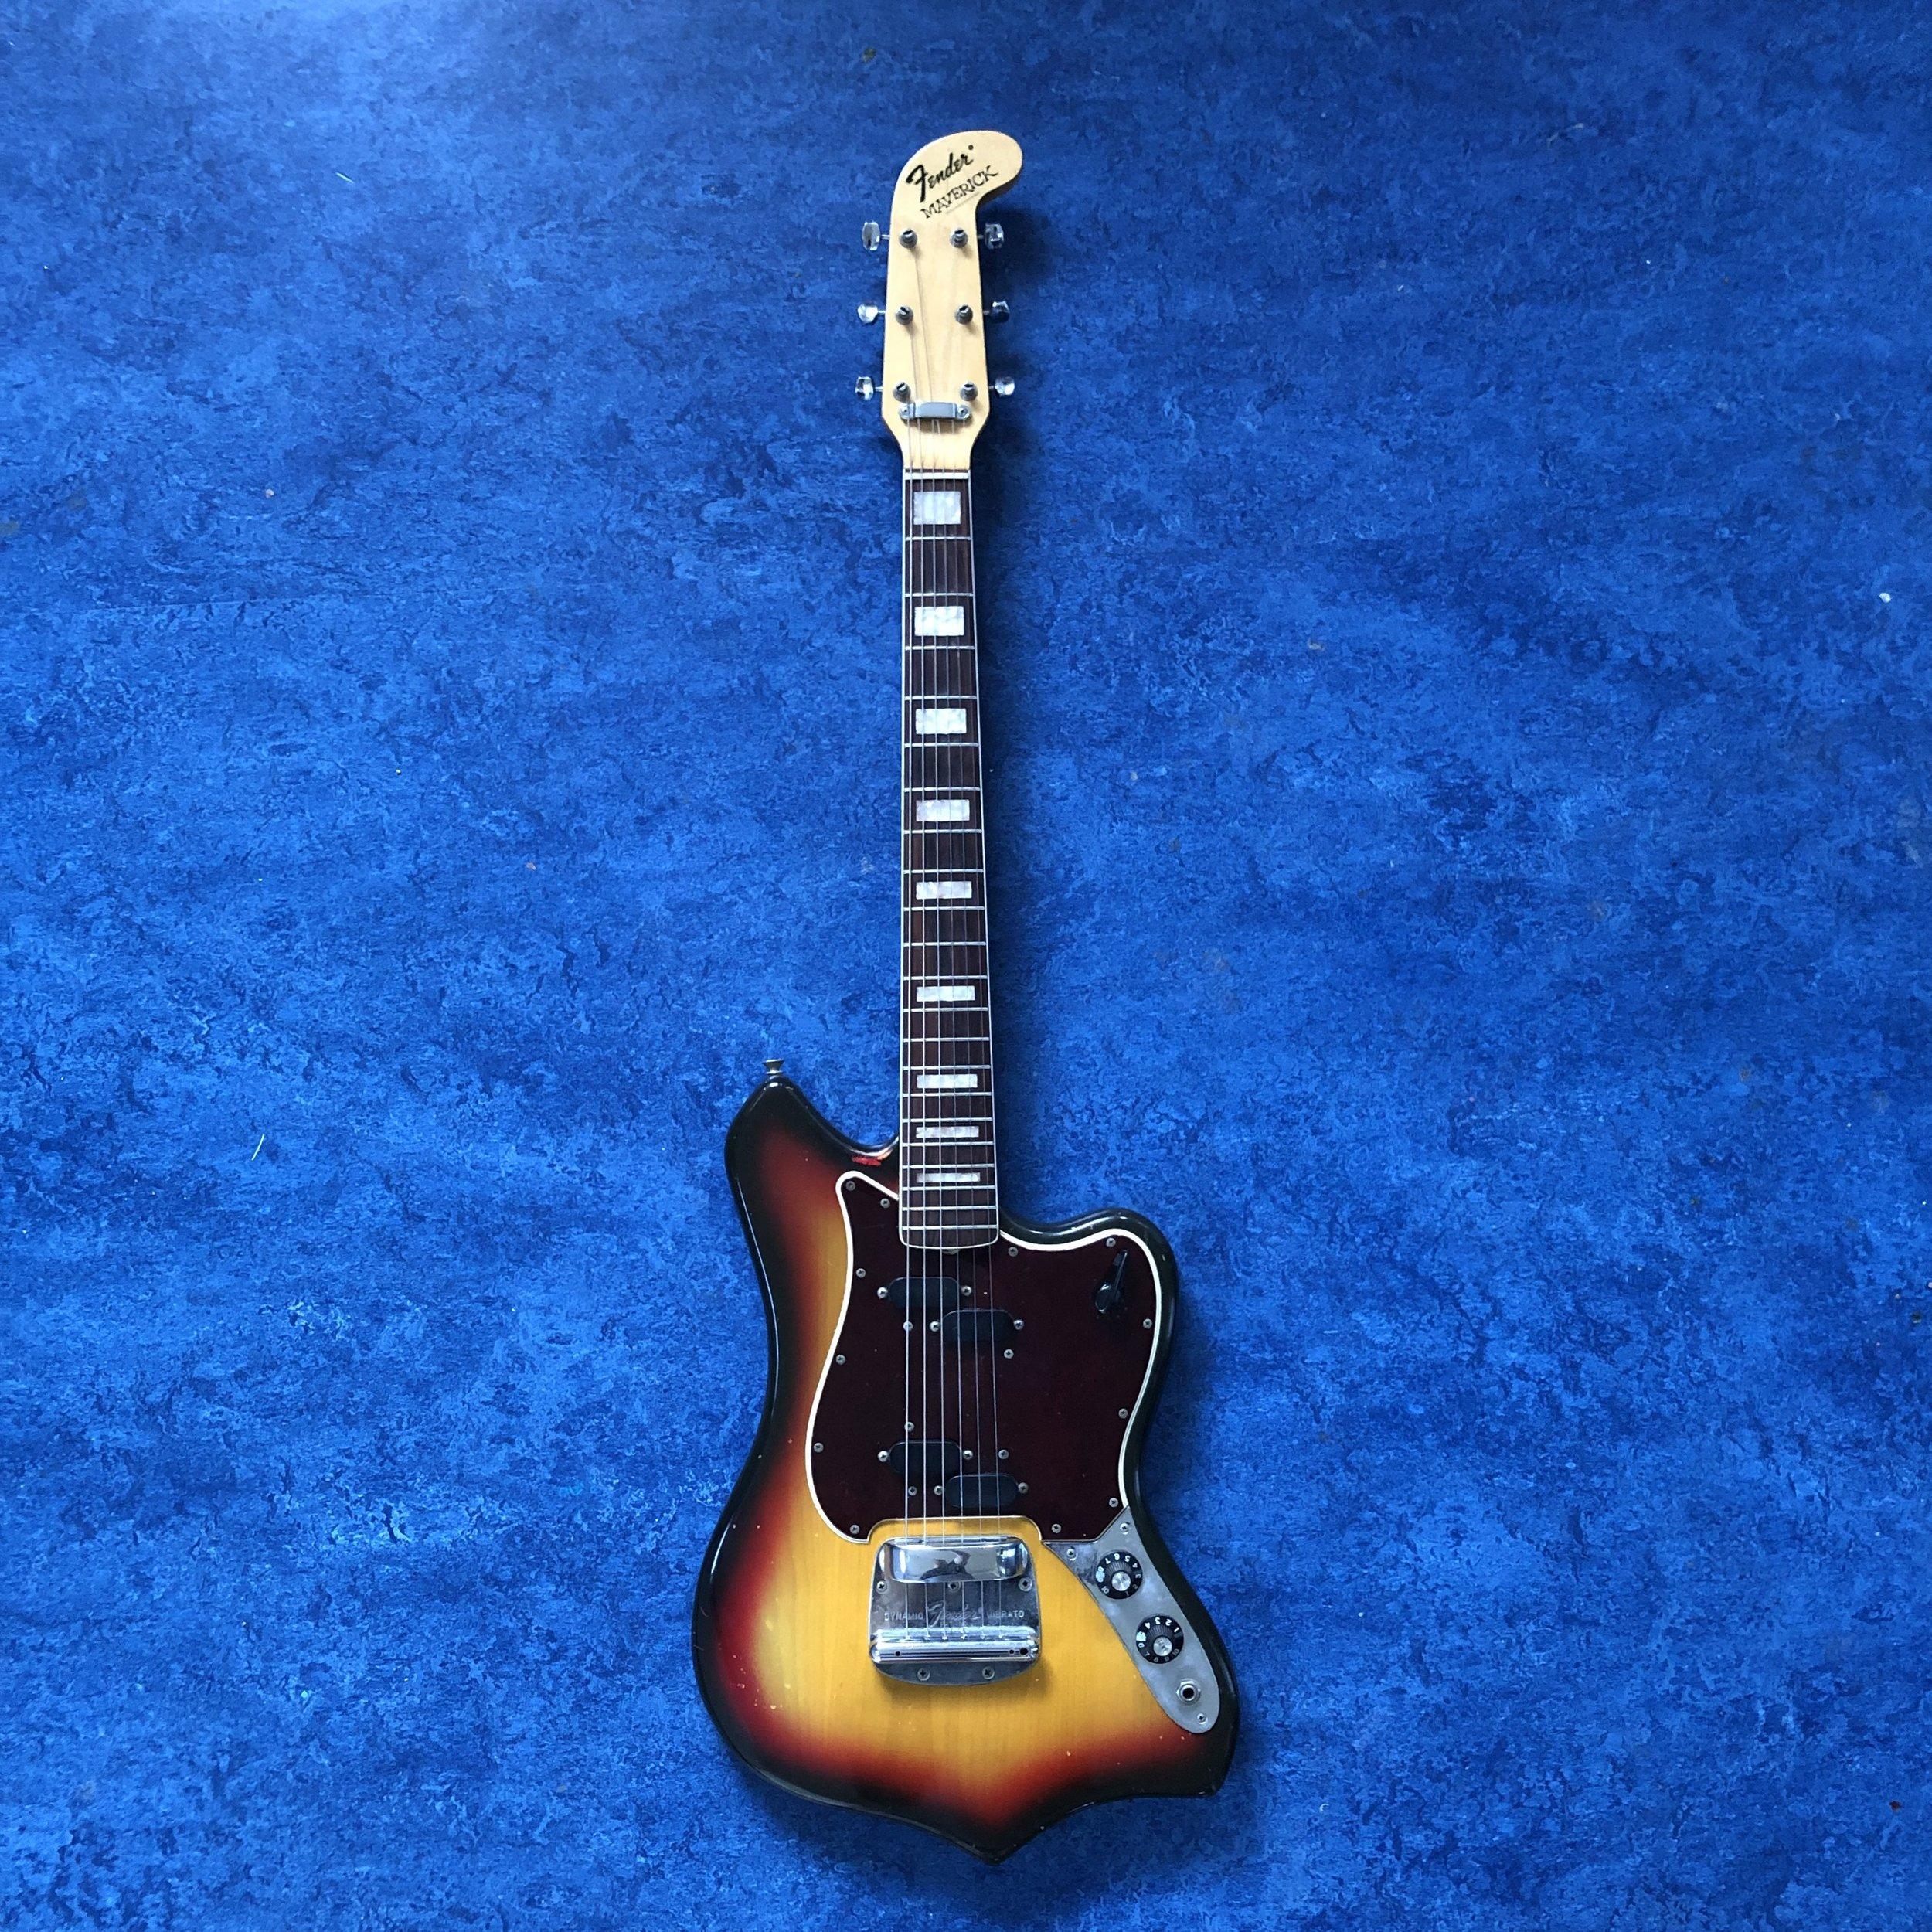 fender-maverick-guitar.jpg